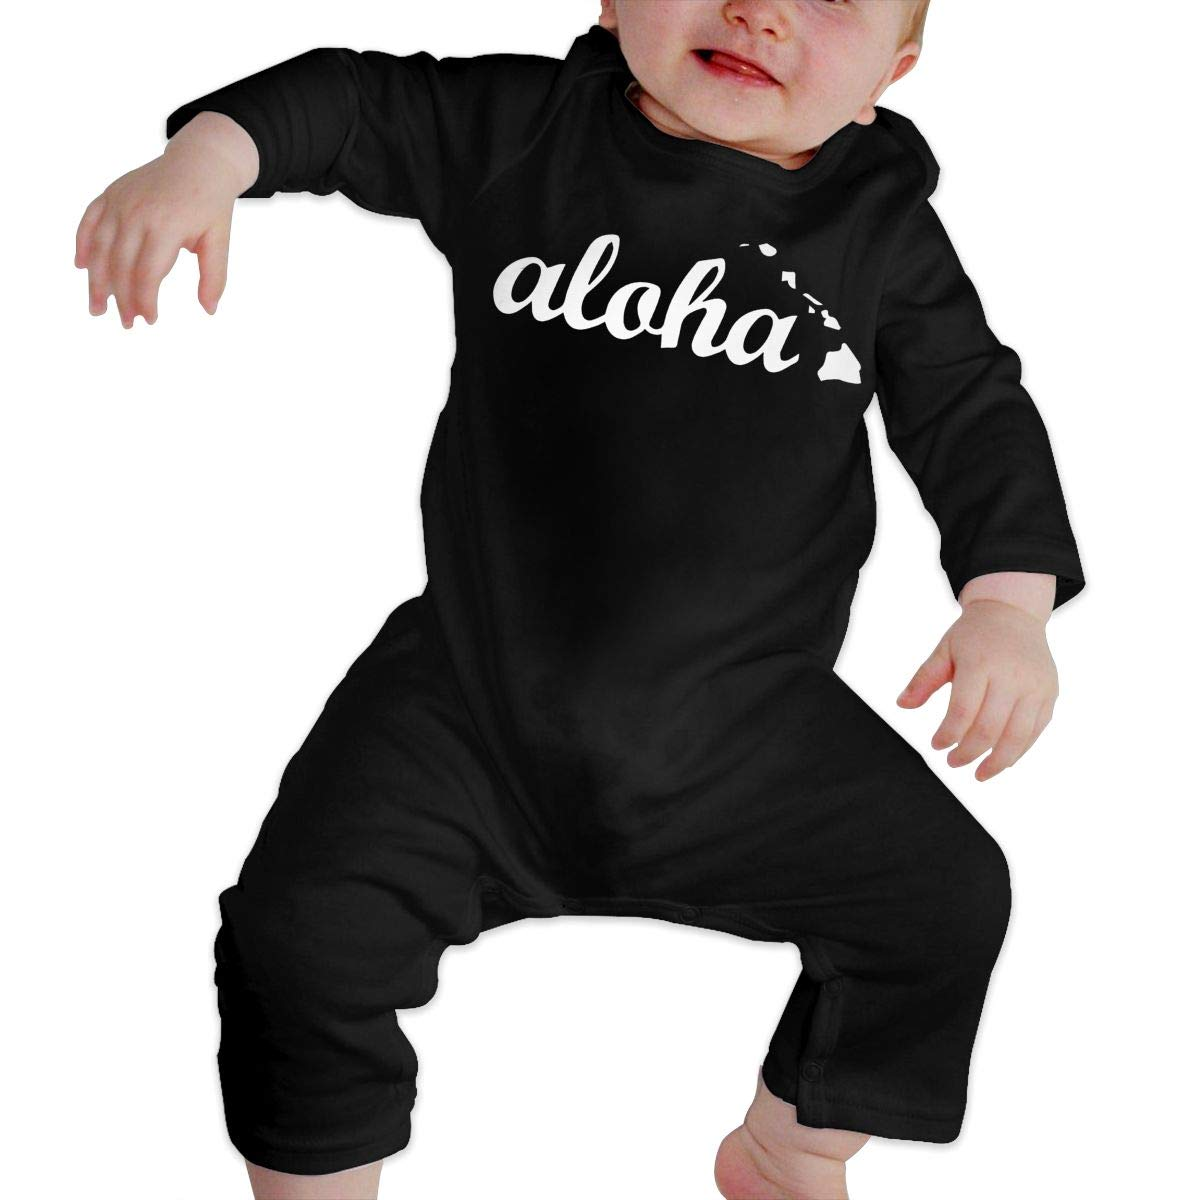 Aloha Hawaiian Islands Baby Boy Girl Long Sleeve Romper Jumpsuit Coverall